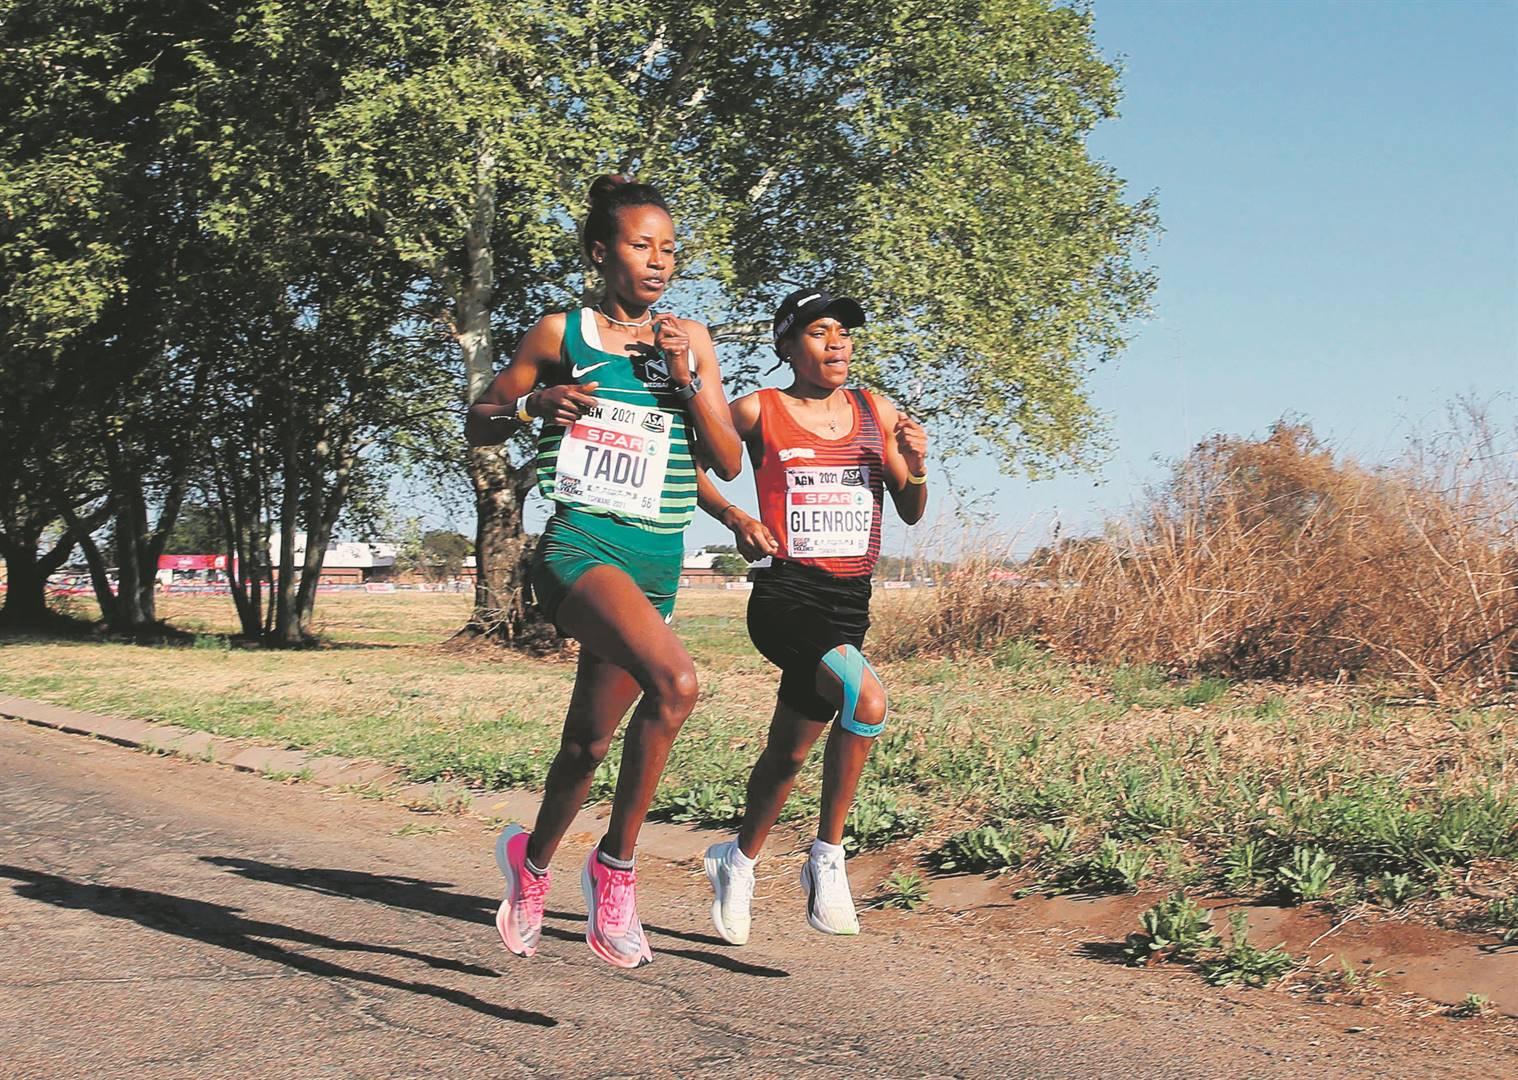 Tadu Nare is tracked by Glenrose Xaba during the fourth leg of the Spar Women's Challenge in Tshwane on Friday PHOTO: Reg Caldecott